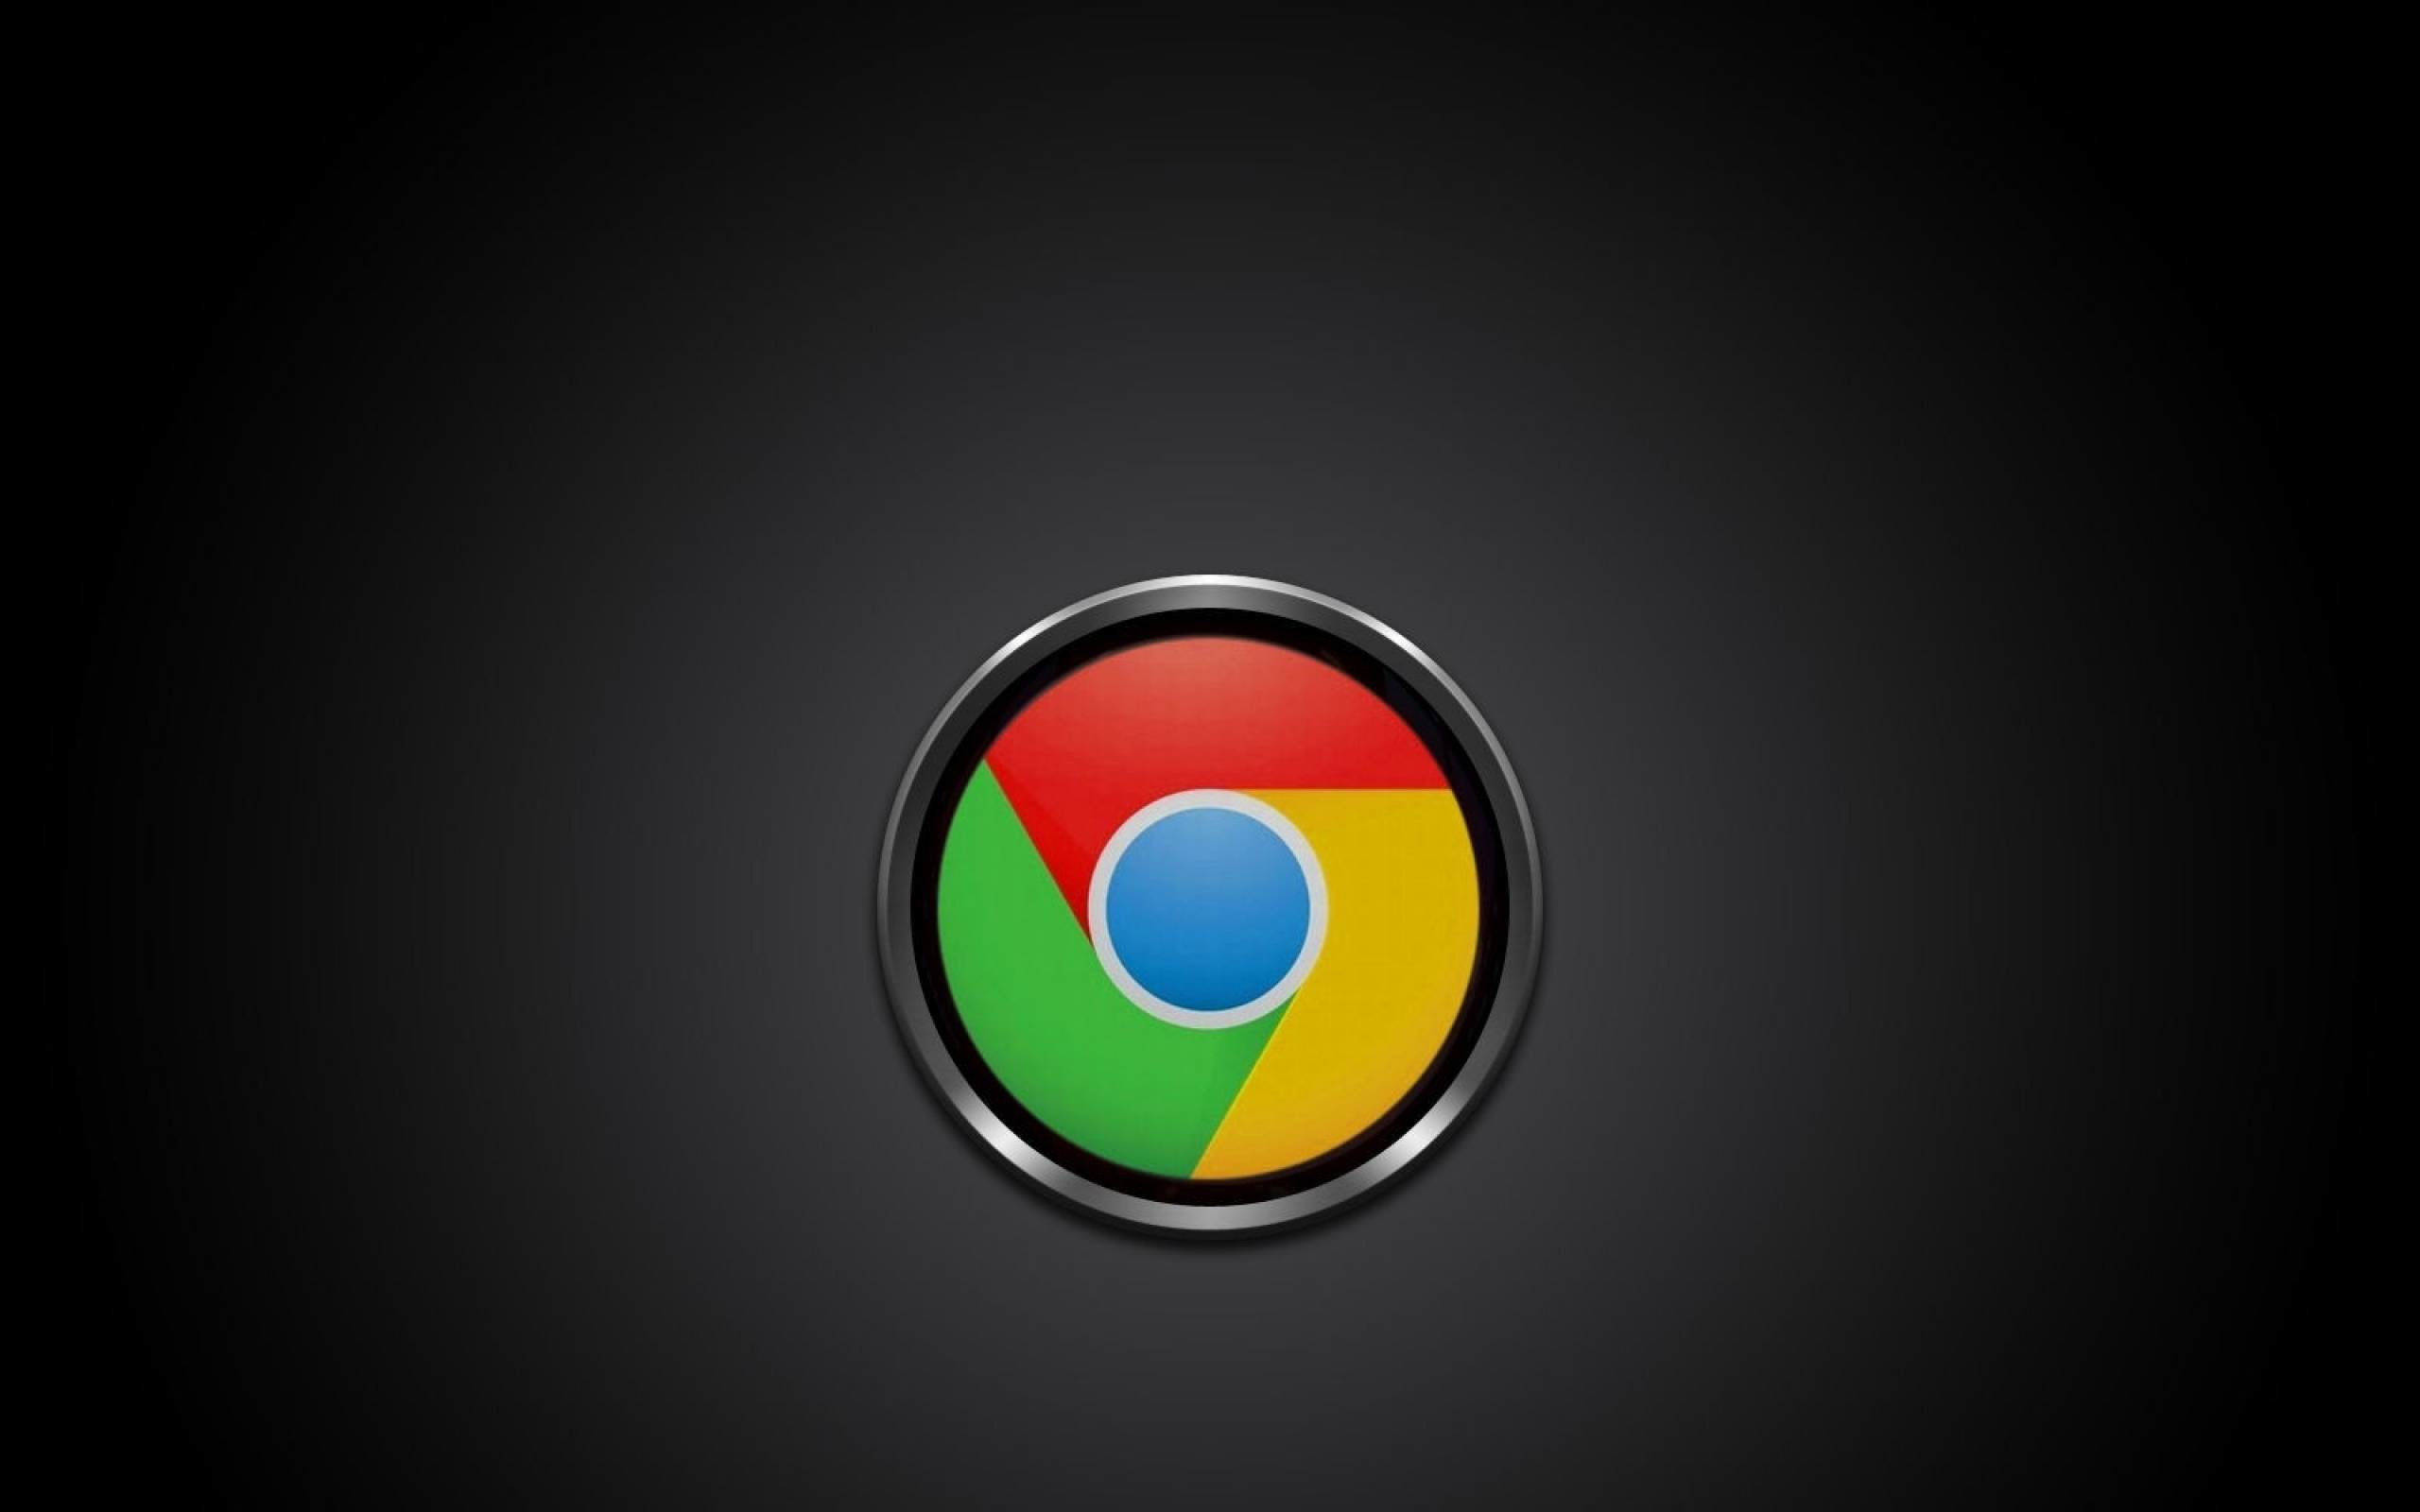 Google Chrome Wallpaper Full Hd | Amazing Wallpapers | Pinterest | Wallpaper